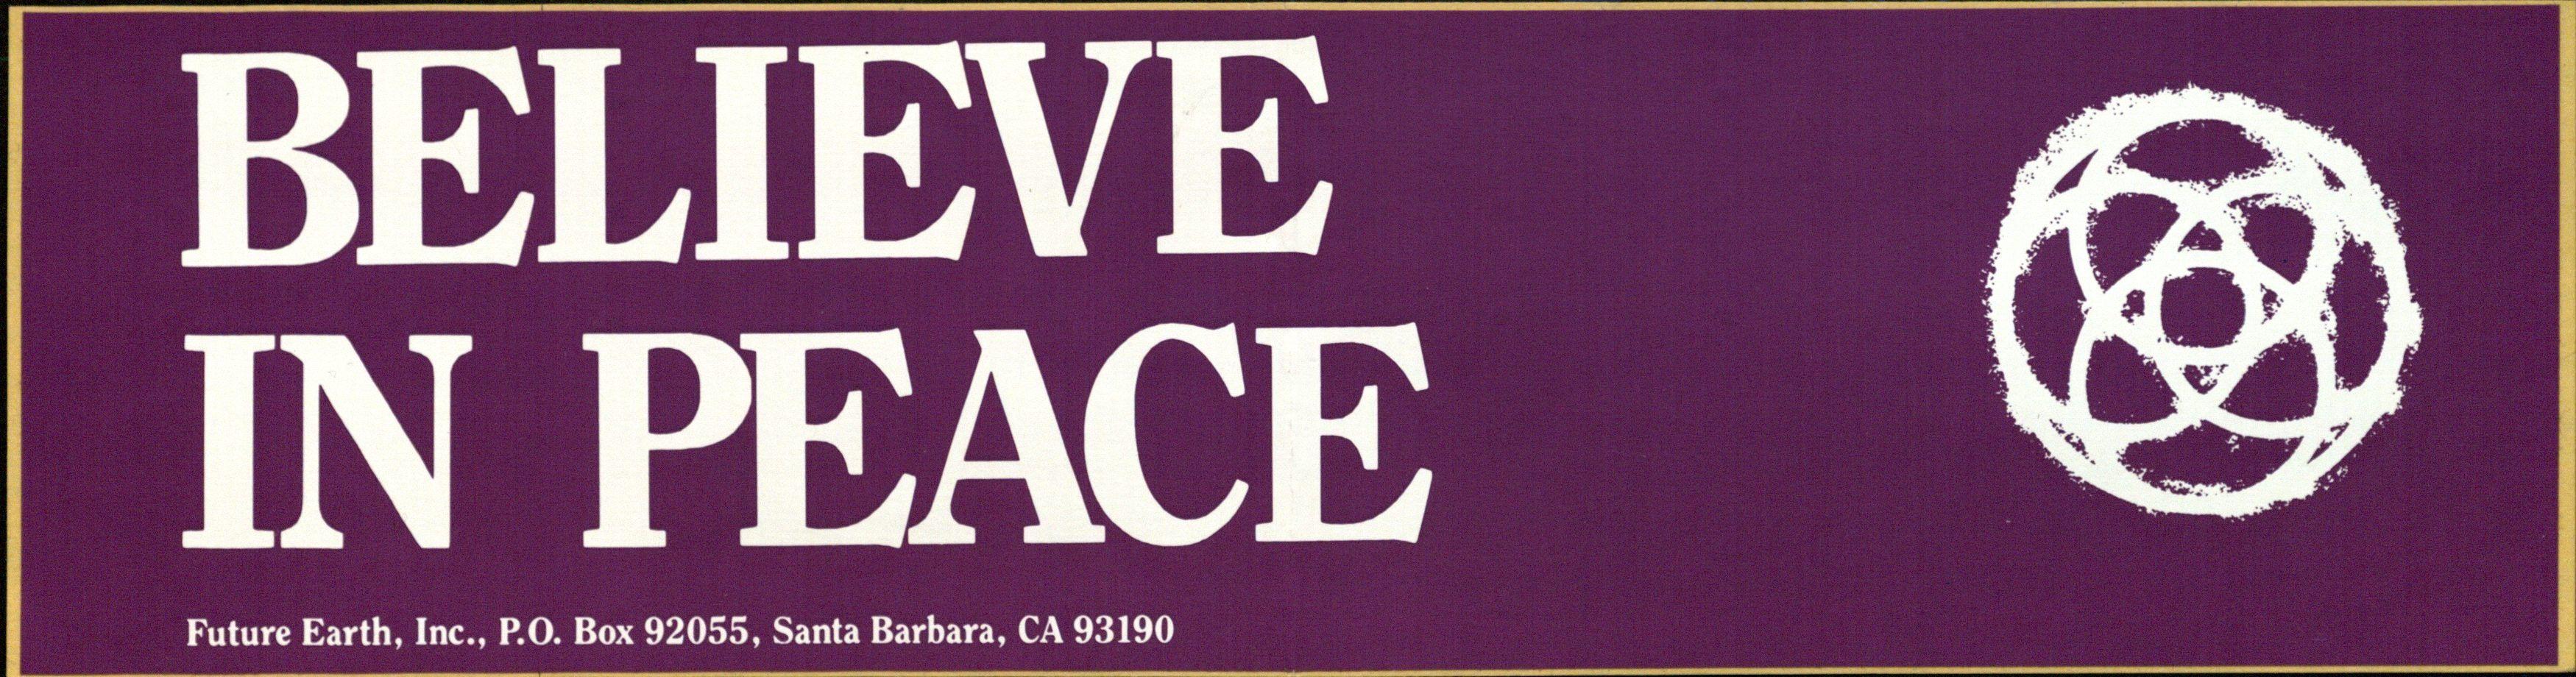 Bumper Sticker: Believe in Peace